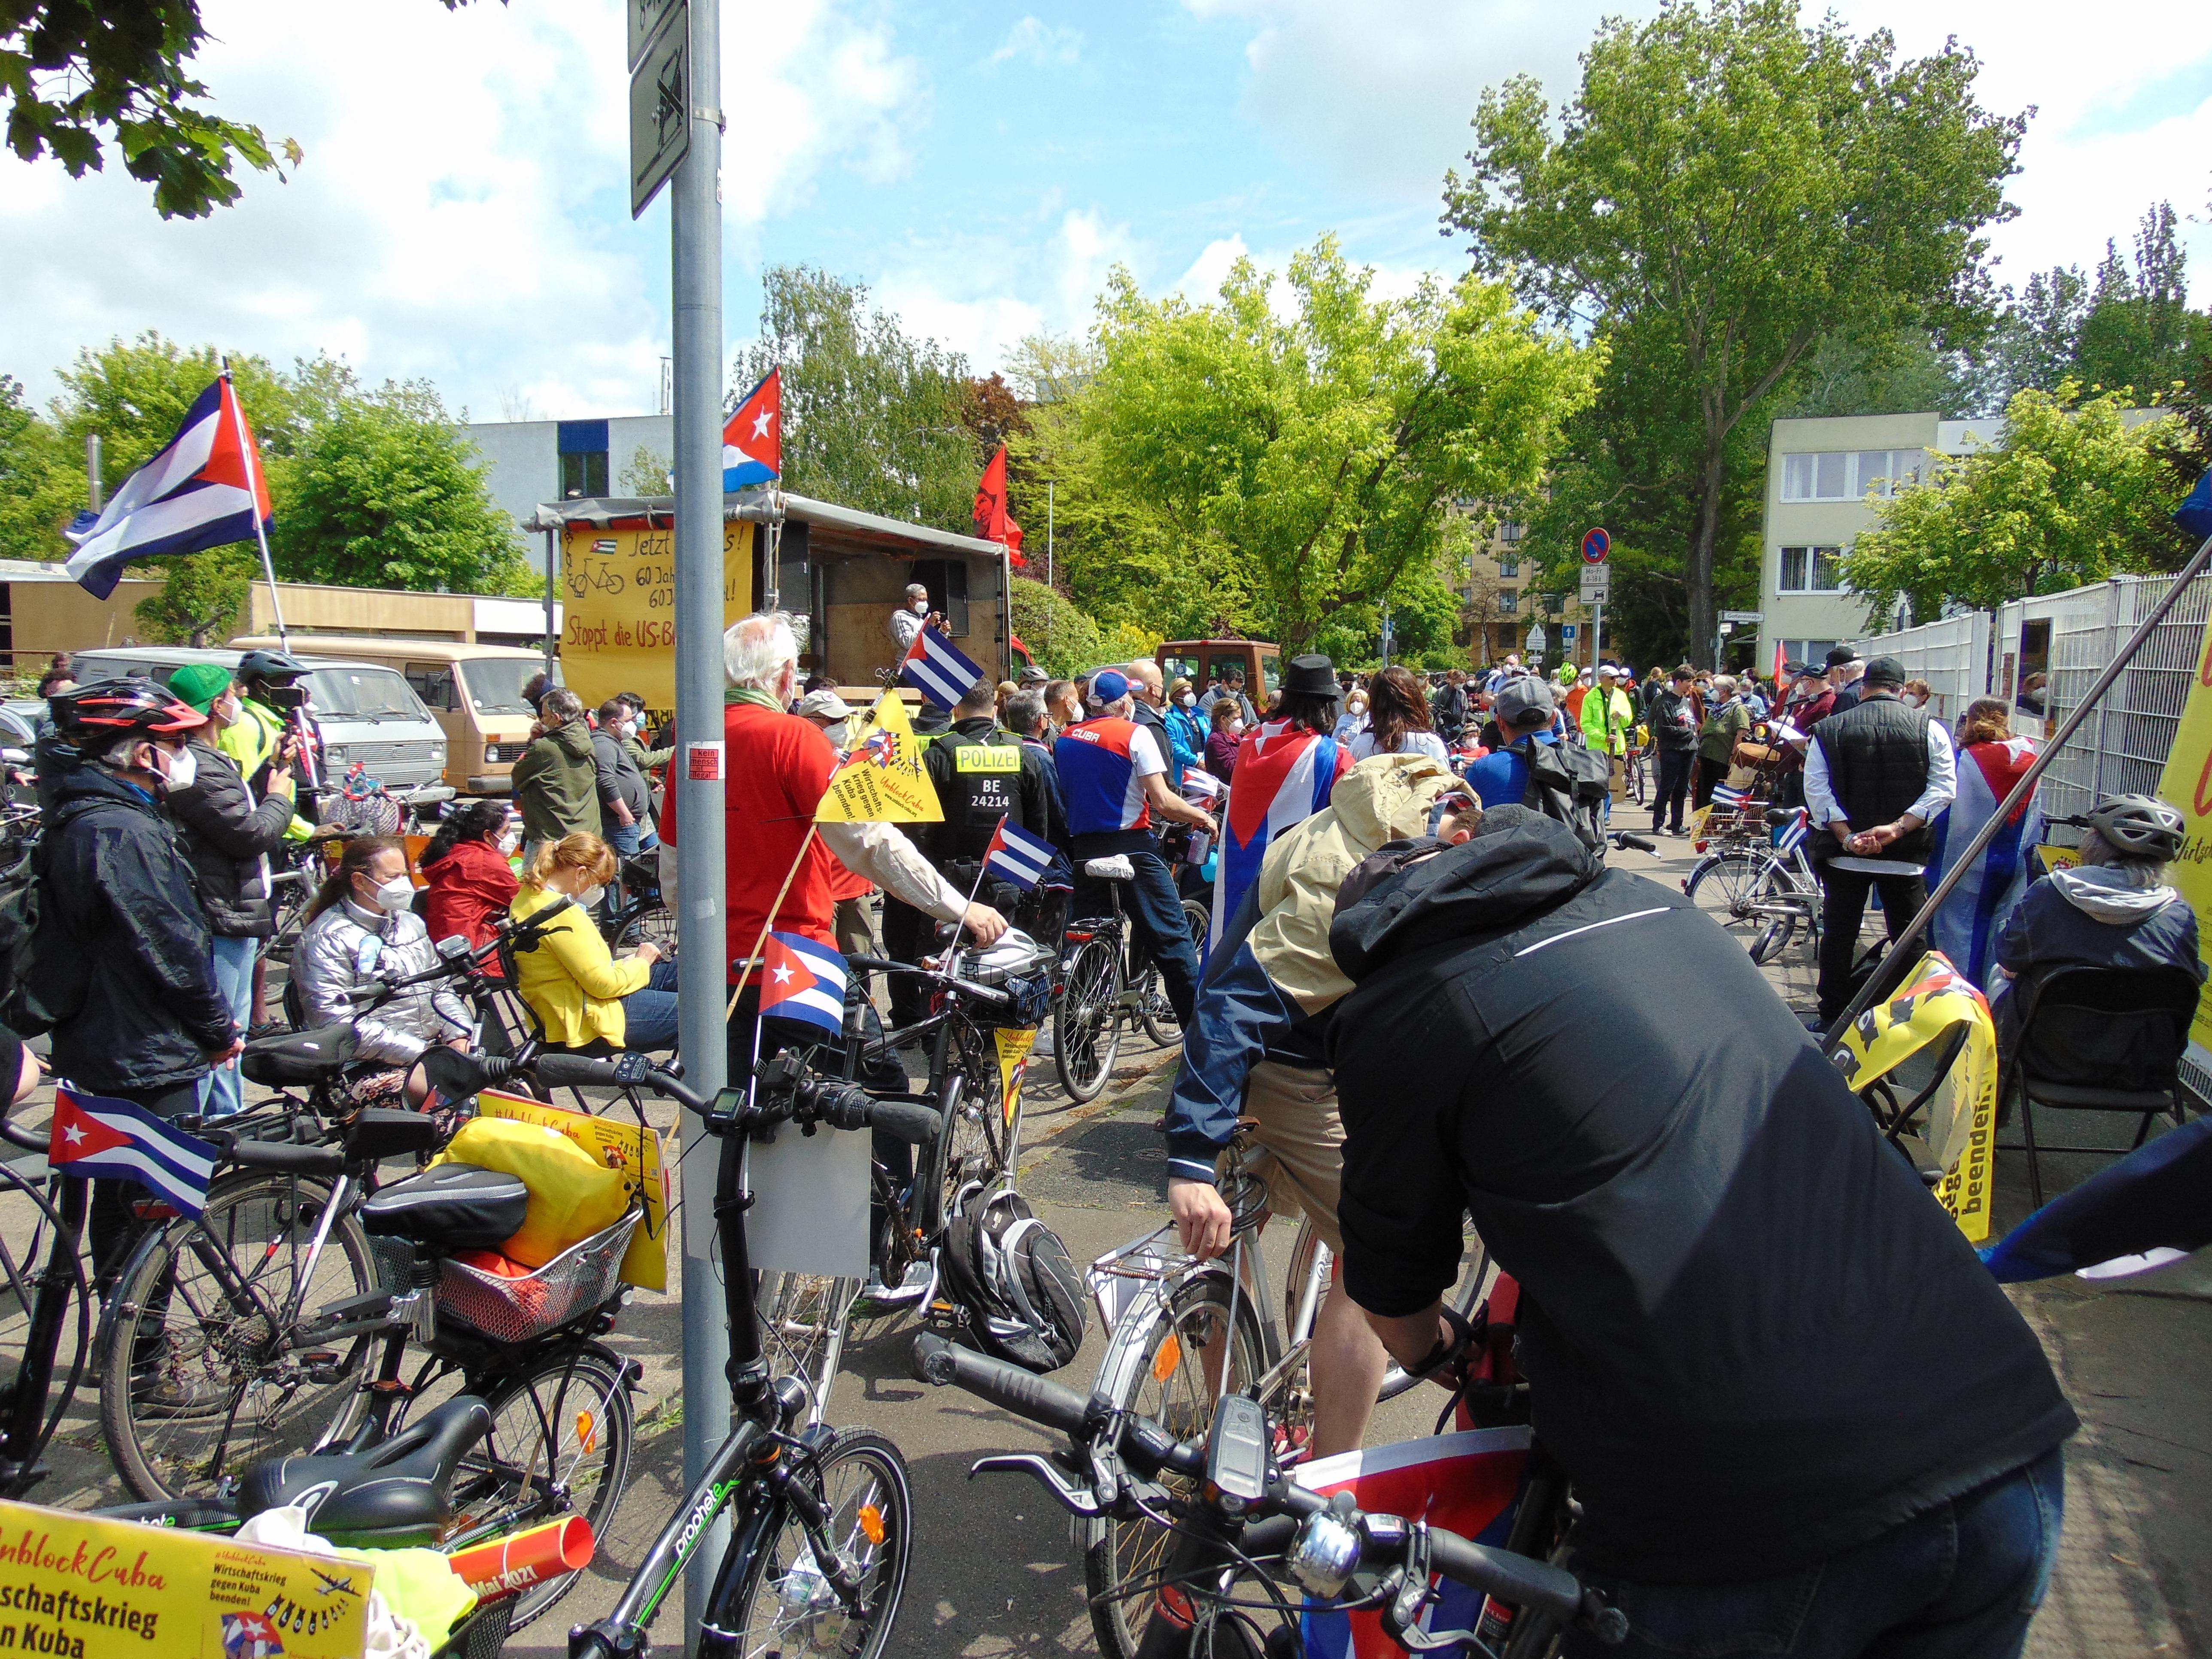 Unblockcuba-Fahrraddemo in Berlin